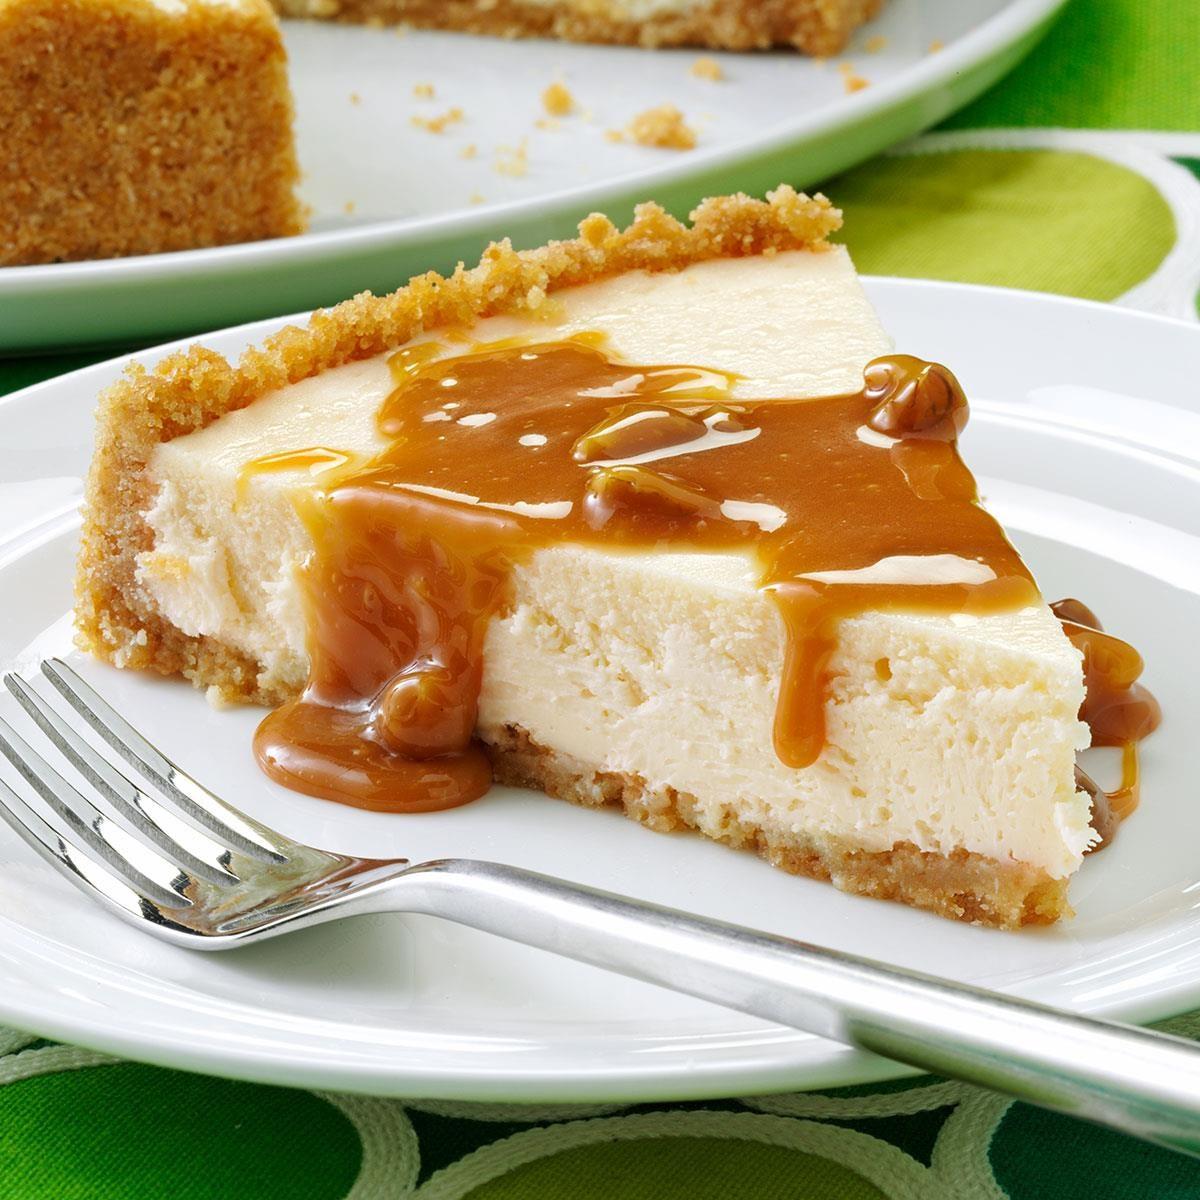 Caramel Cheesecake Recipe